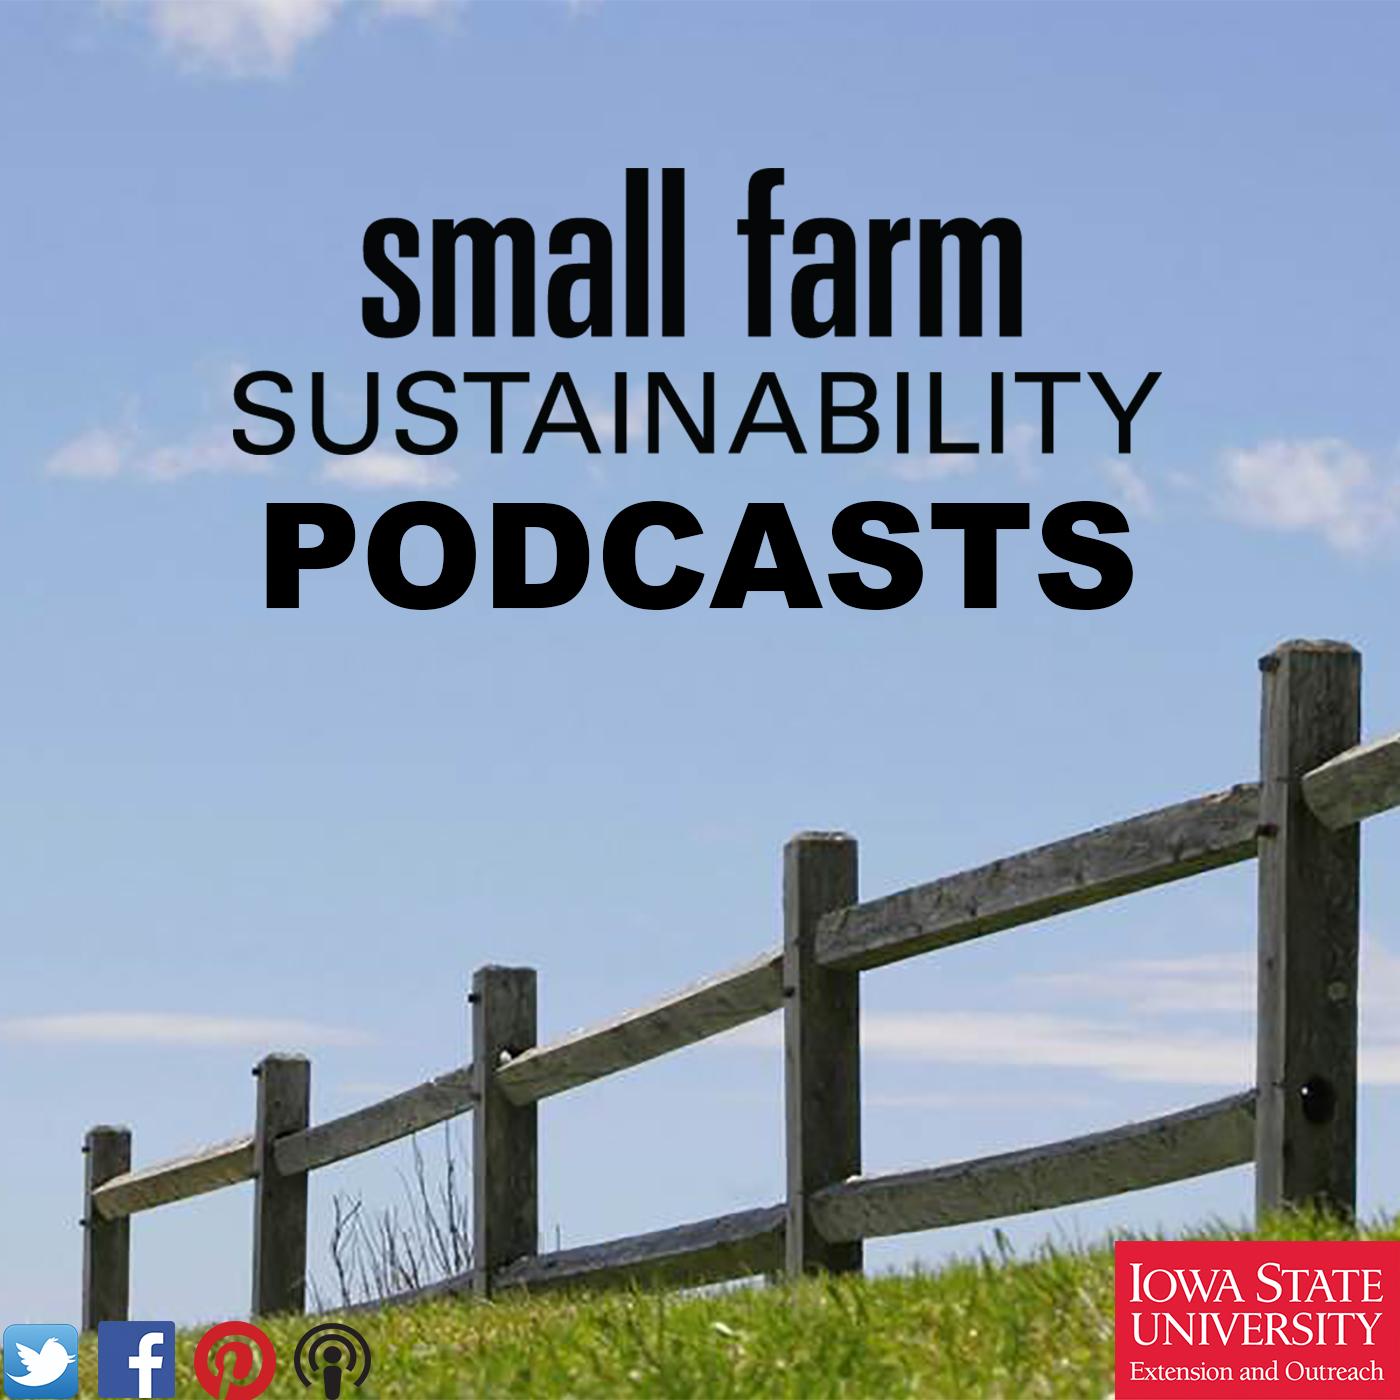 smallfarmsustainability's podcast show art